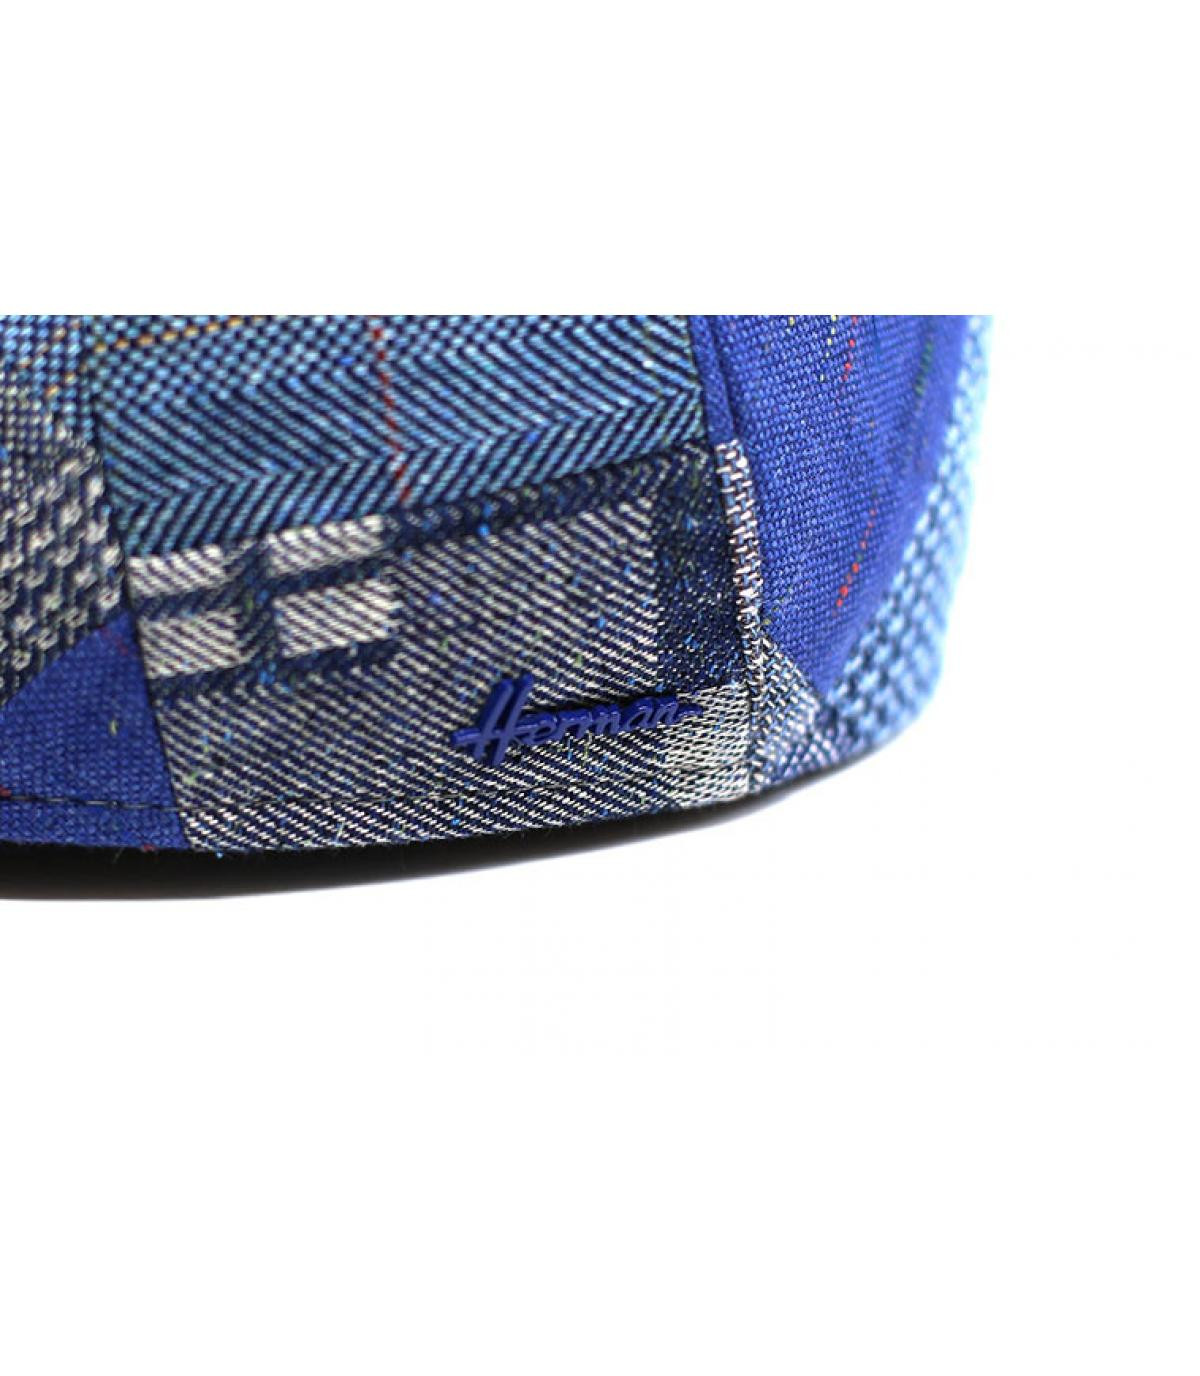 Details Boxer Patch blue - afbeeling 3